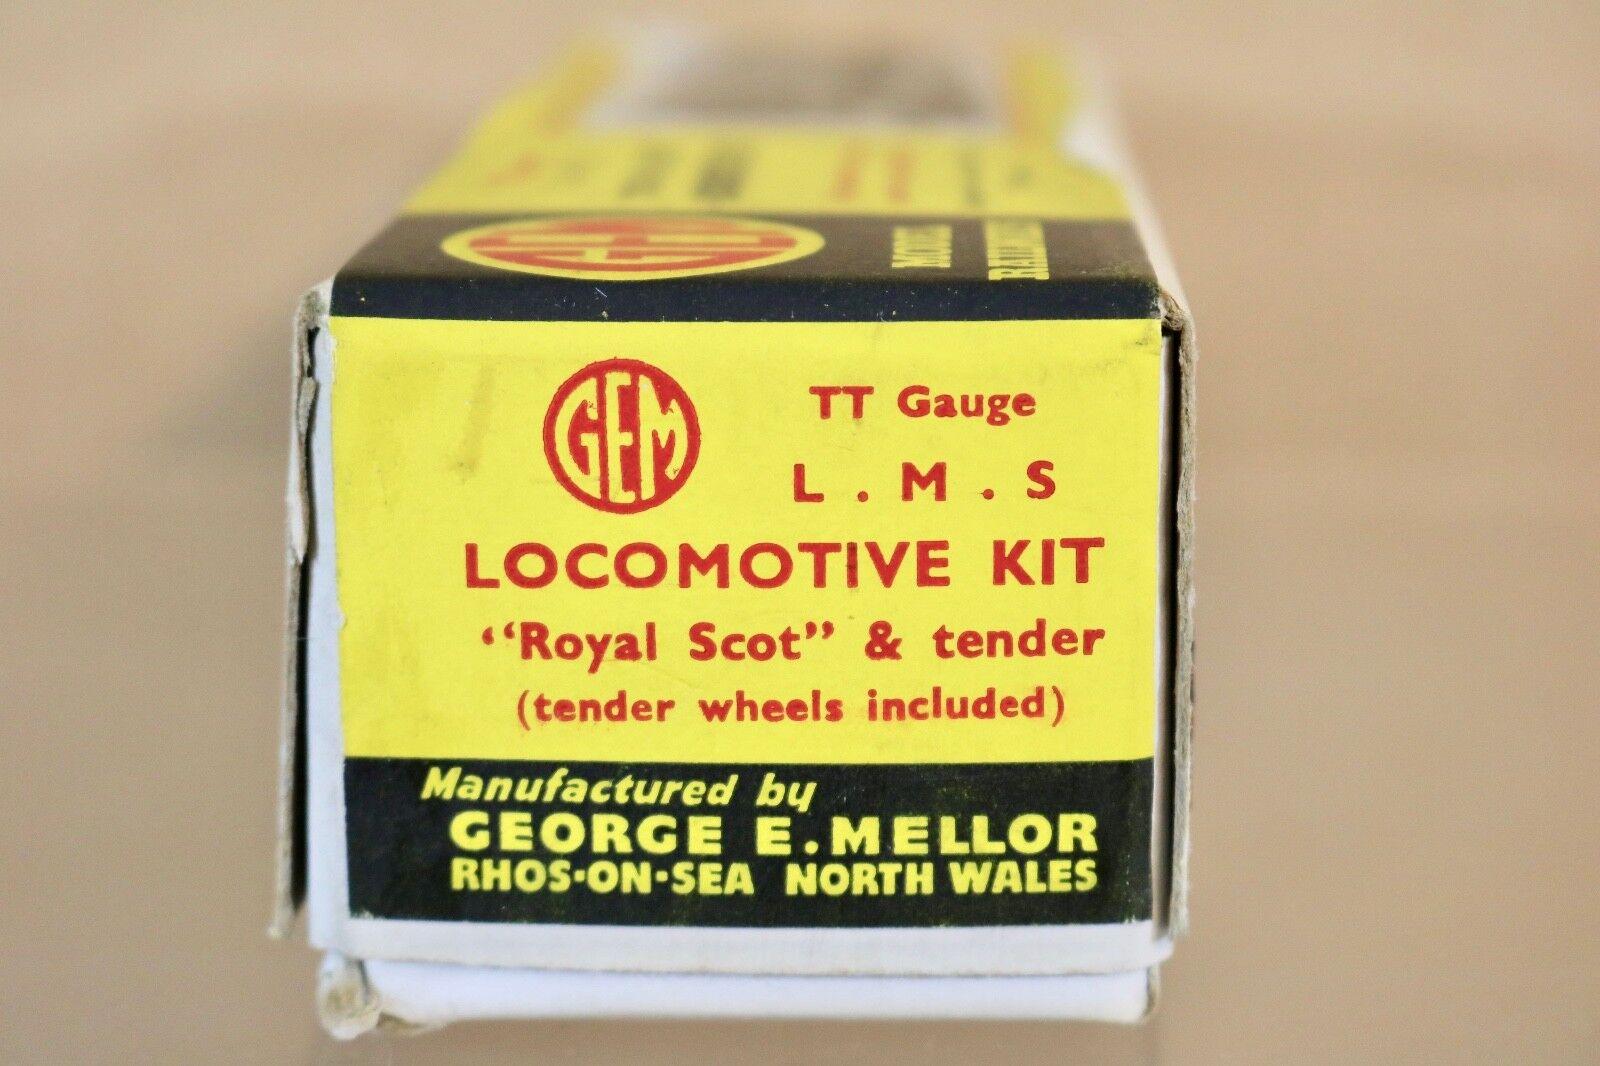 GEM TT GAUGE KIT KIT KIT BUILT LMS 4-6-0 ROYAL SCOTT CLASS LOCOMOTIVE KIT e9b319